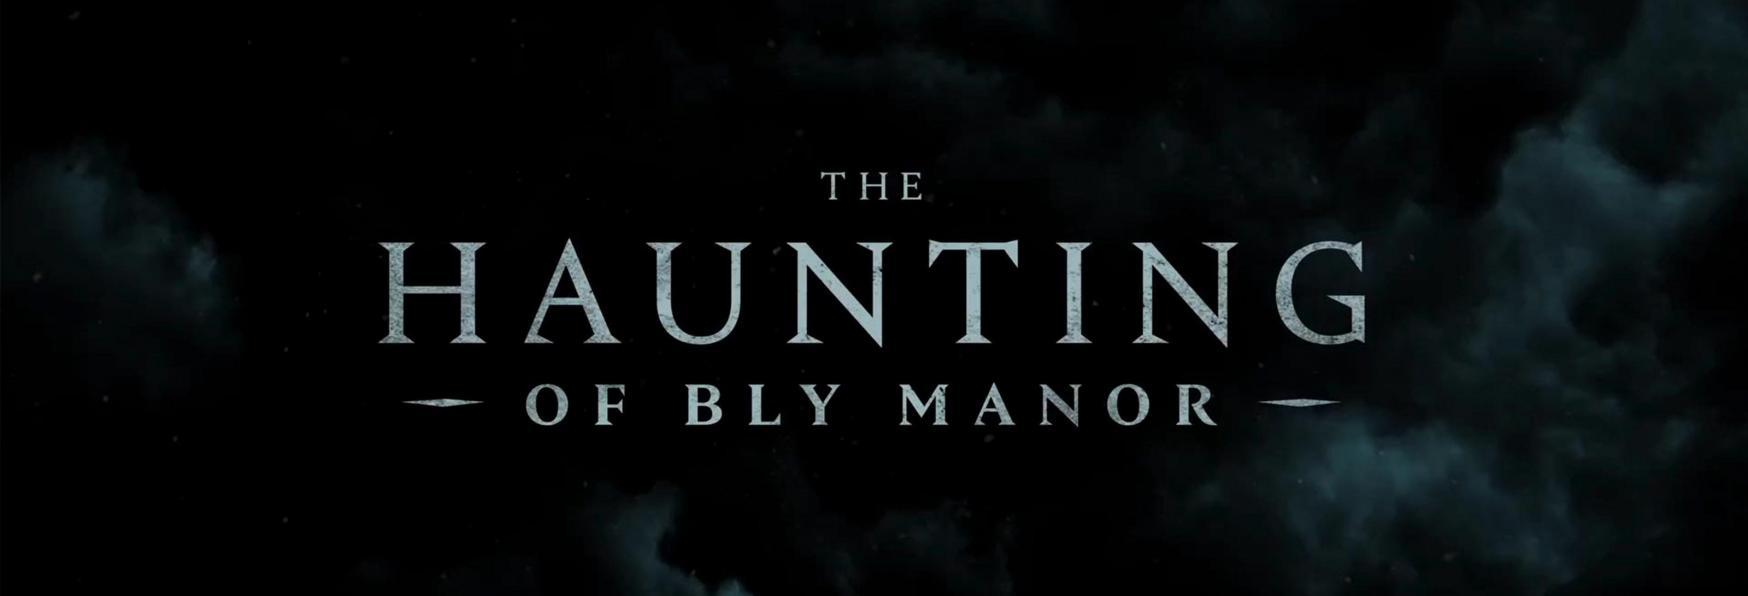 The Haunting of Bly Manor sarà più Spaventoso di Hill House. Parola di Mike Flanagan